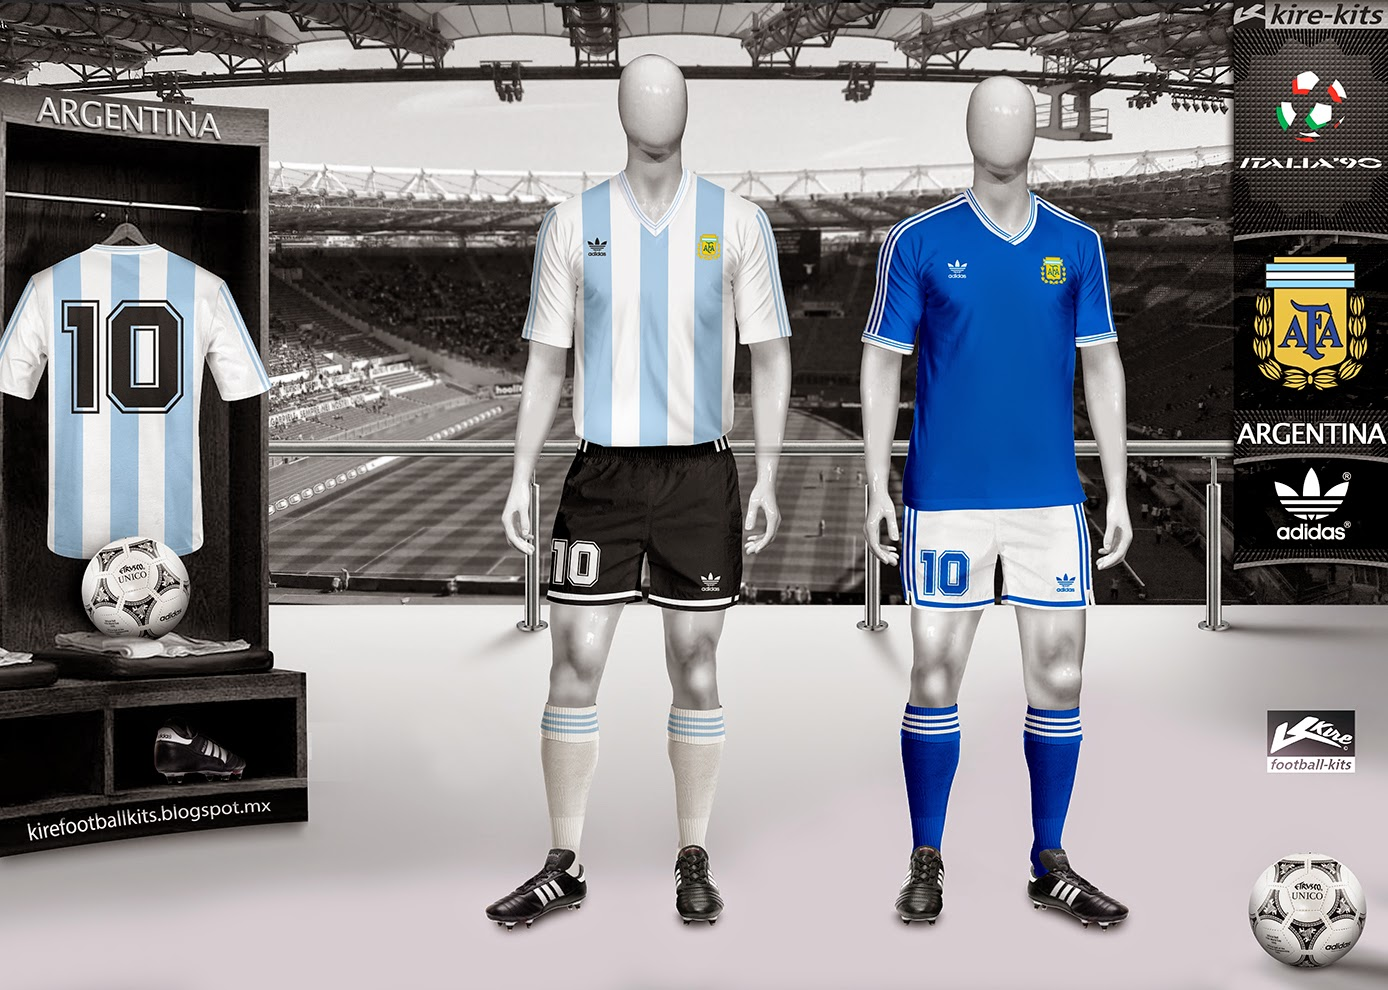 56a7563d8 Kire Football Kits: Argentina kits World Cup 1990